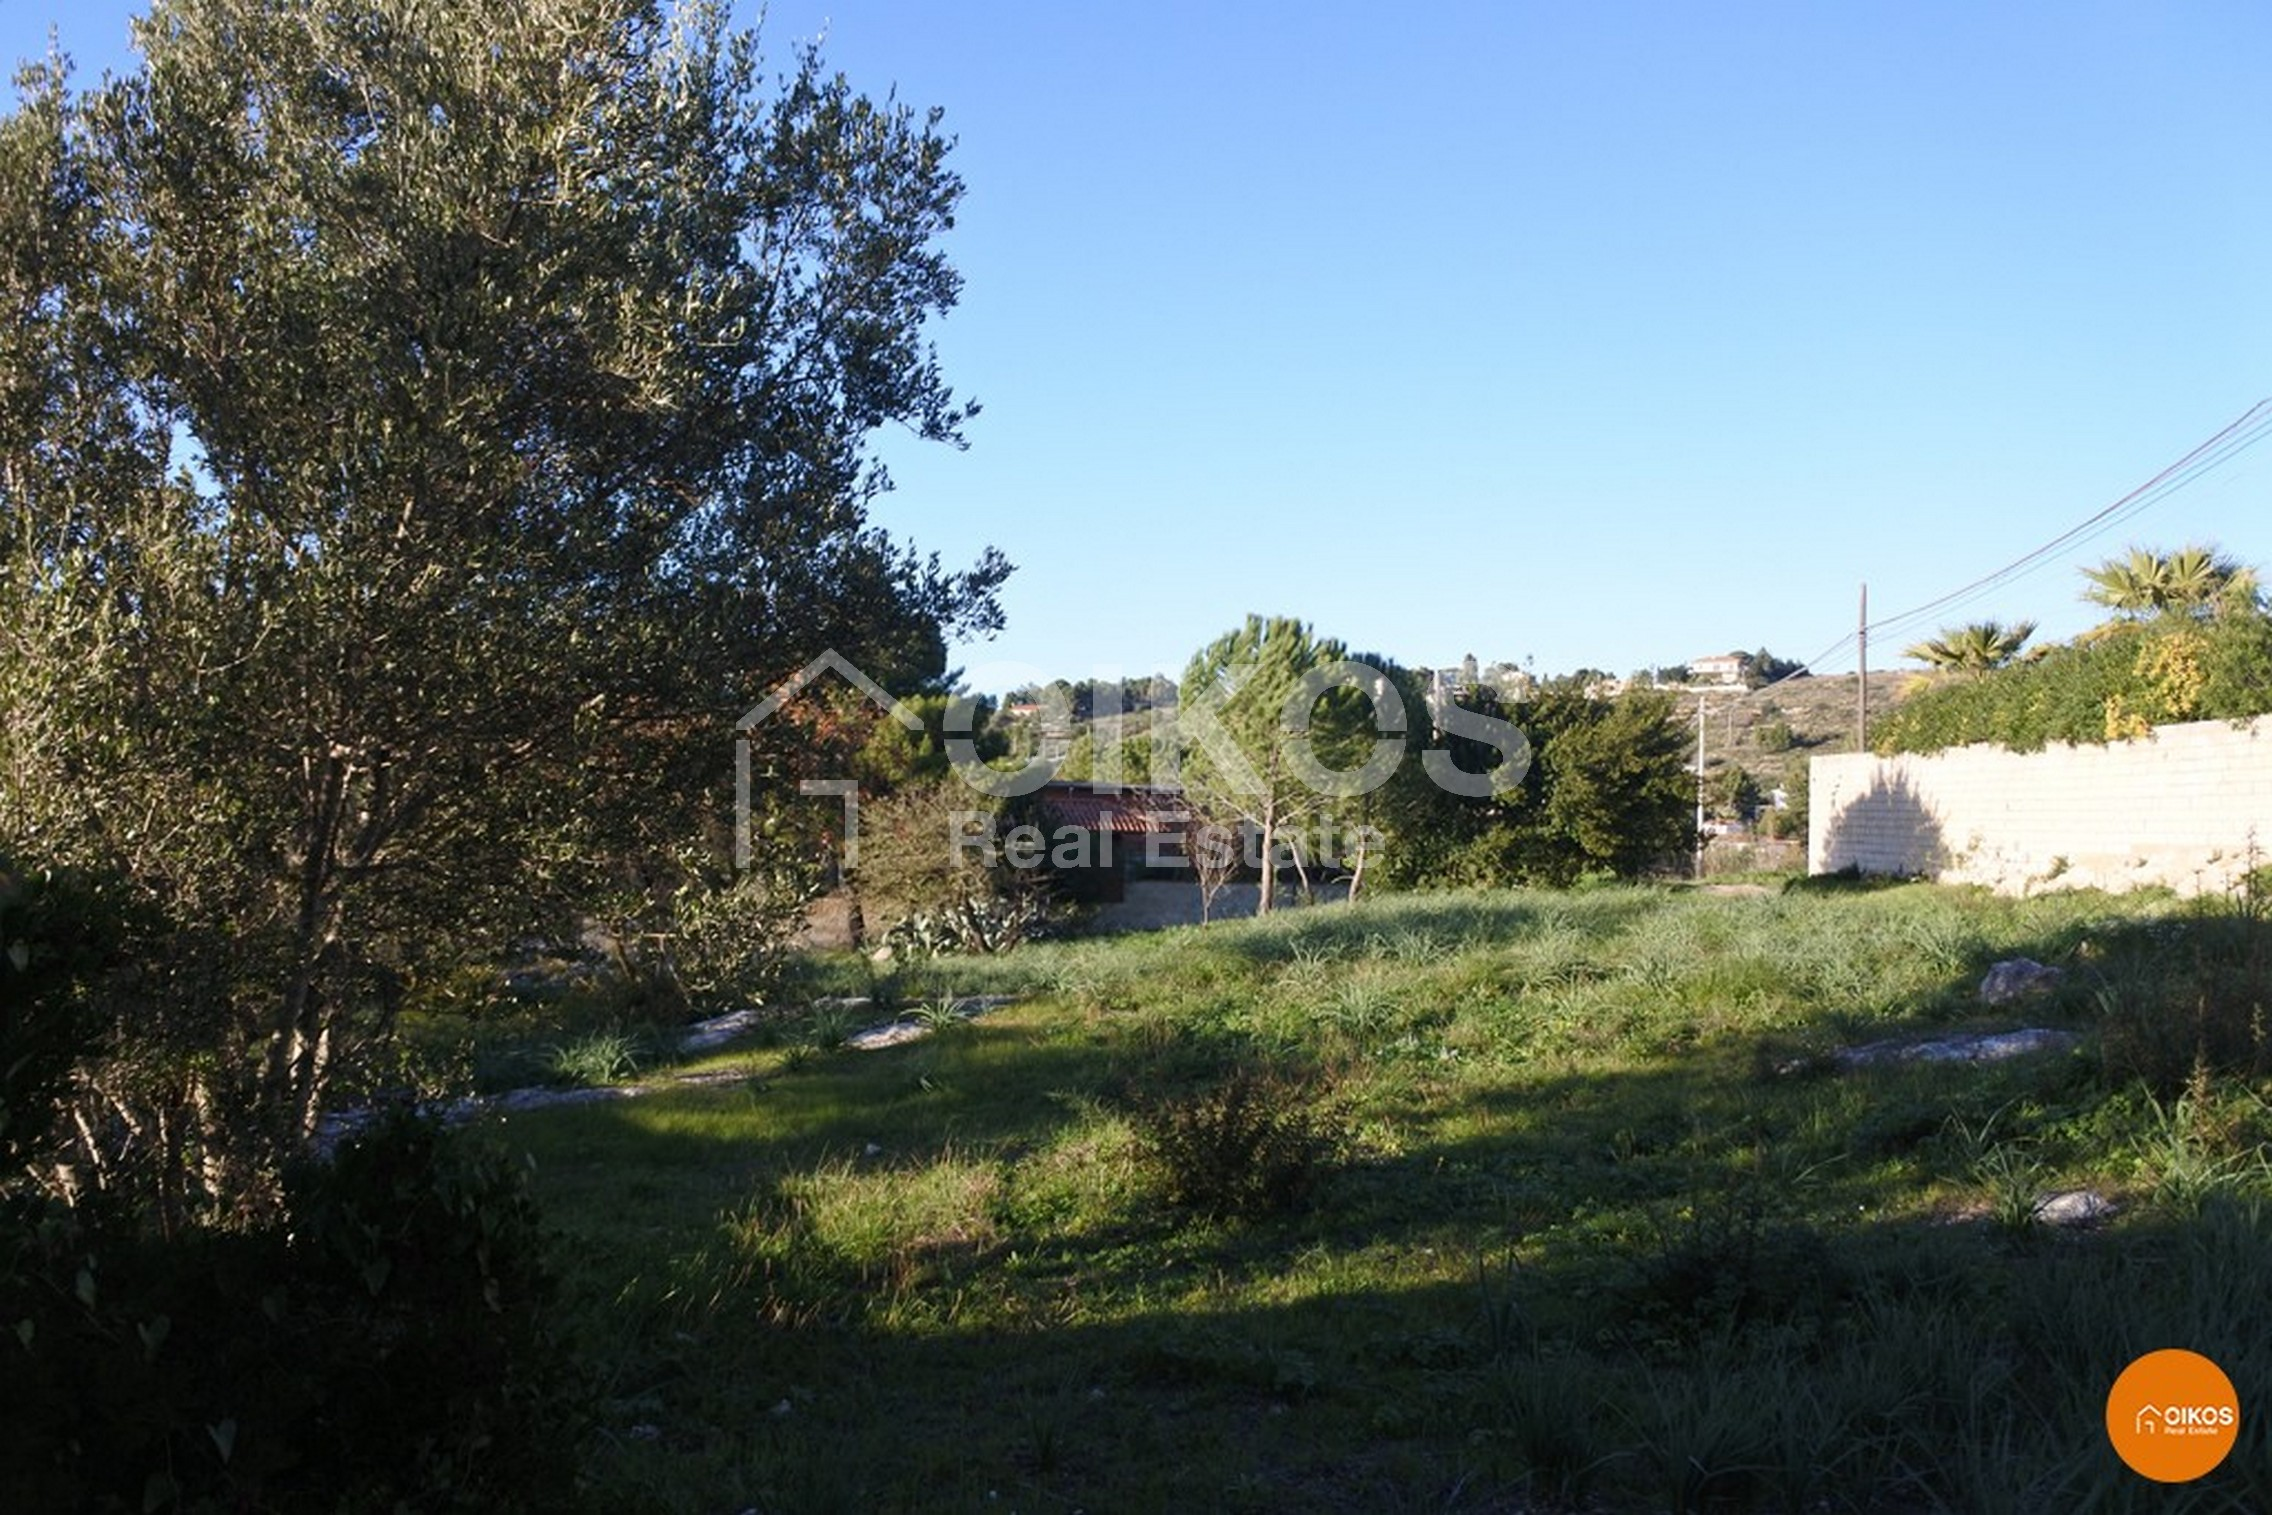 Terreno contrada S. Corrado F.M.